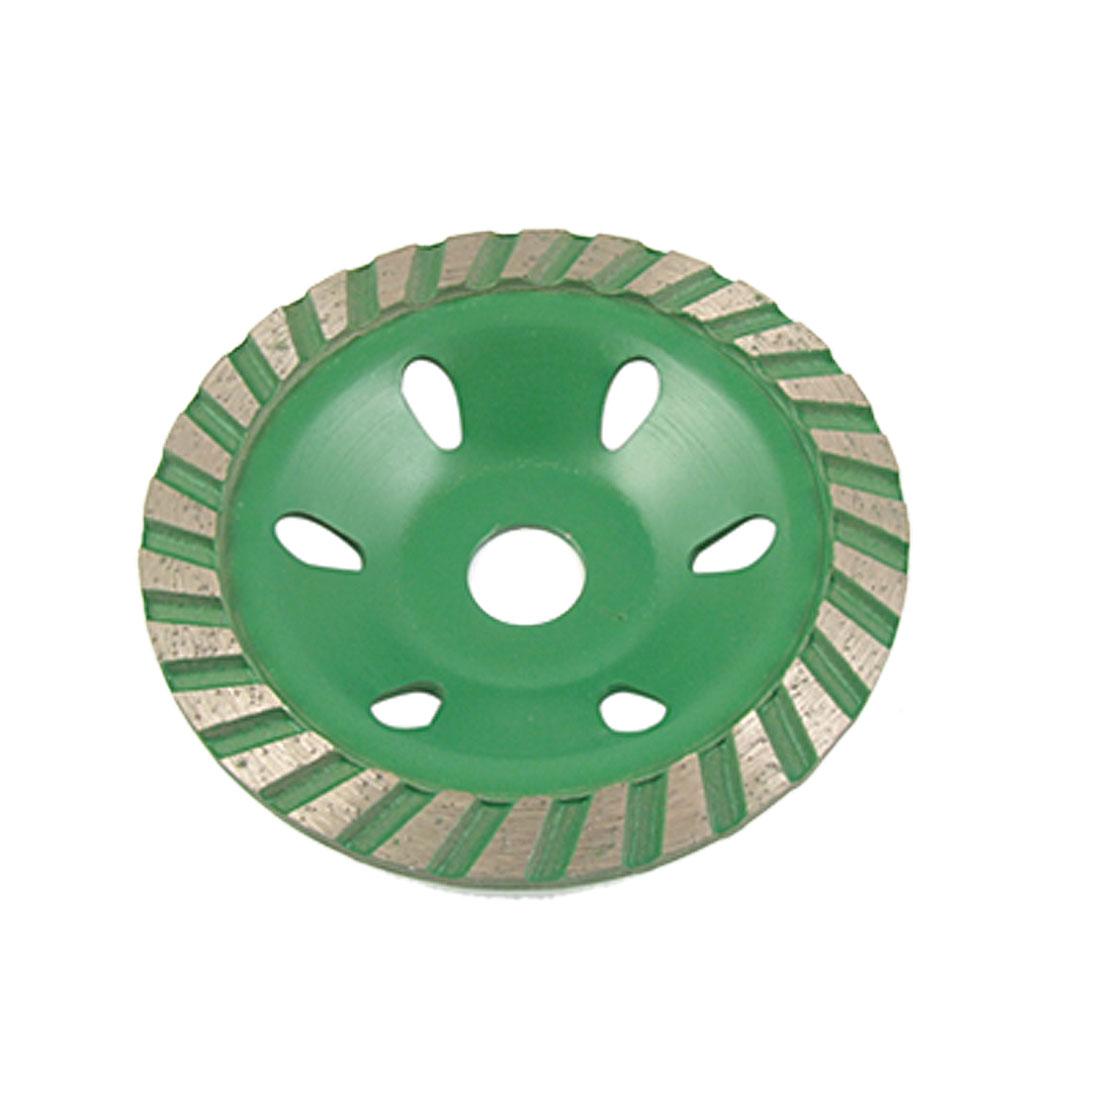 100mm Polishing Ceramic Concrete Grinding Disc Green Gray